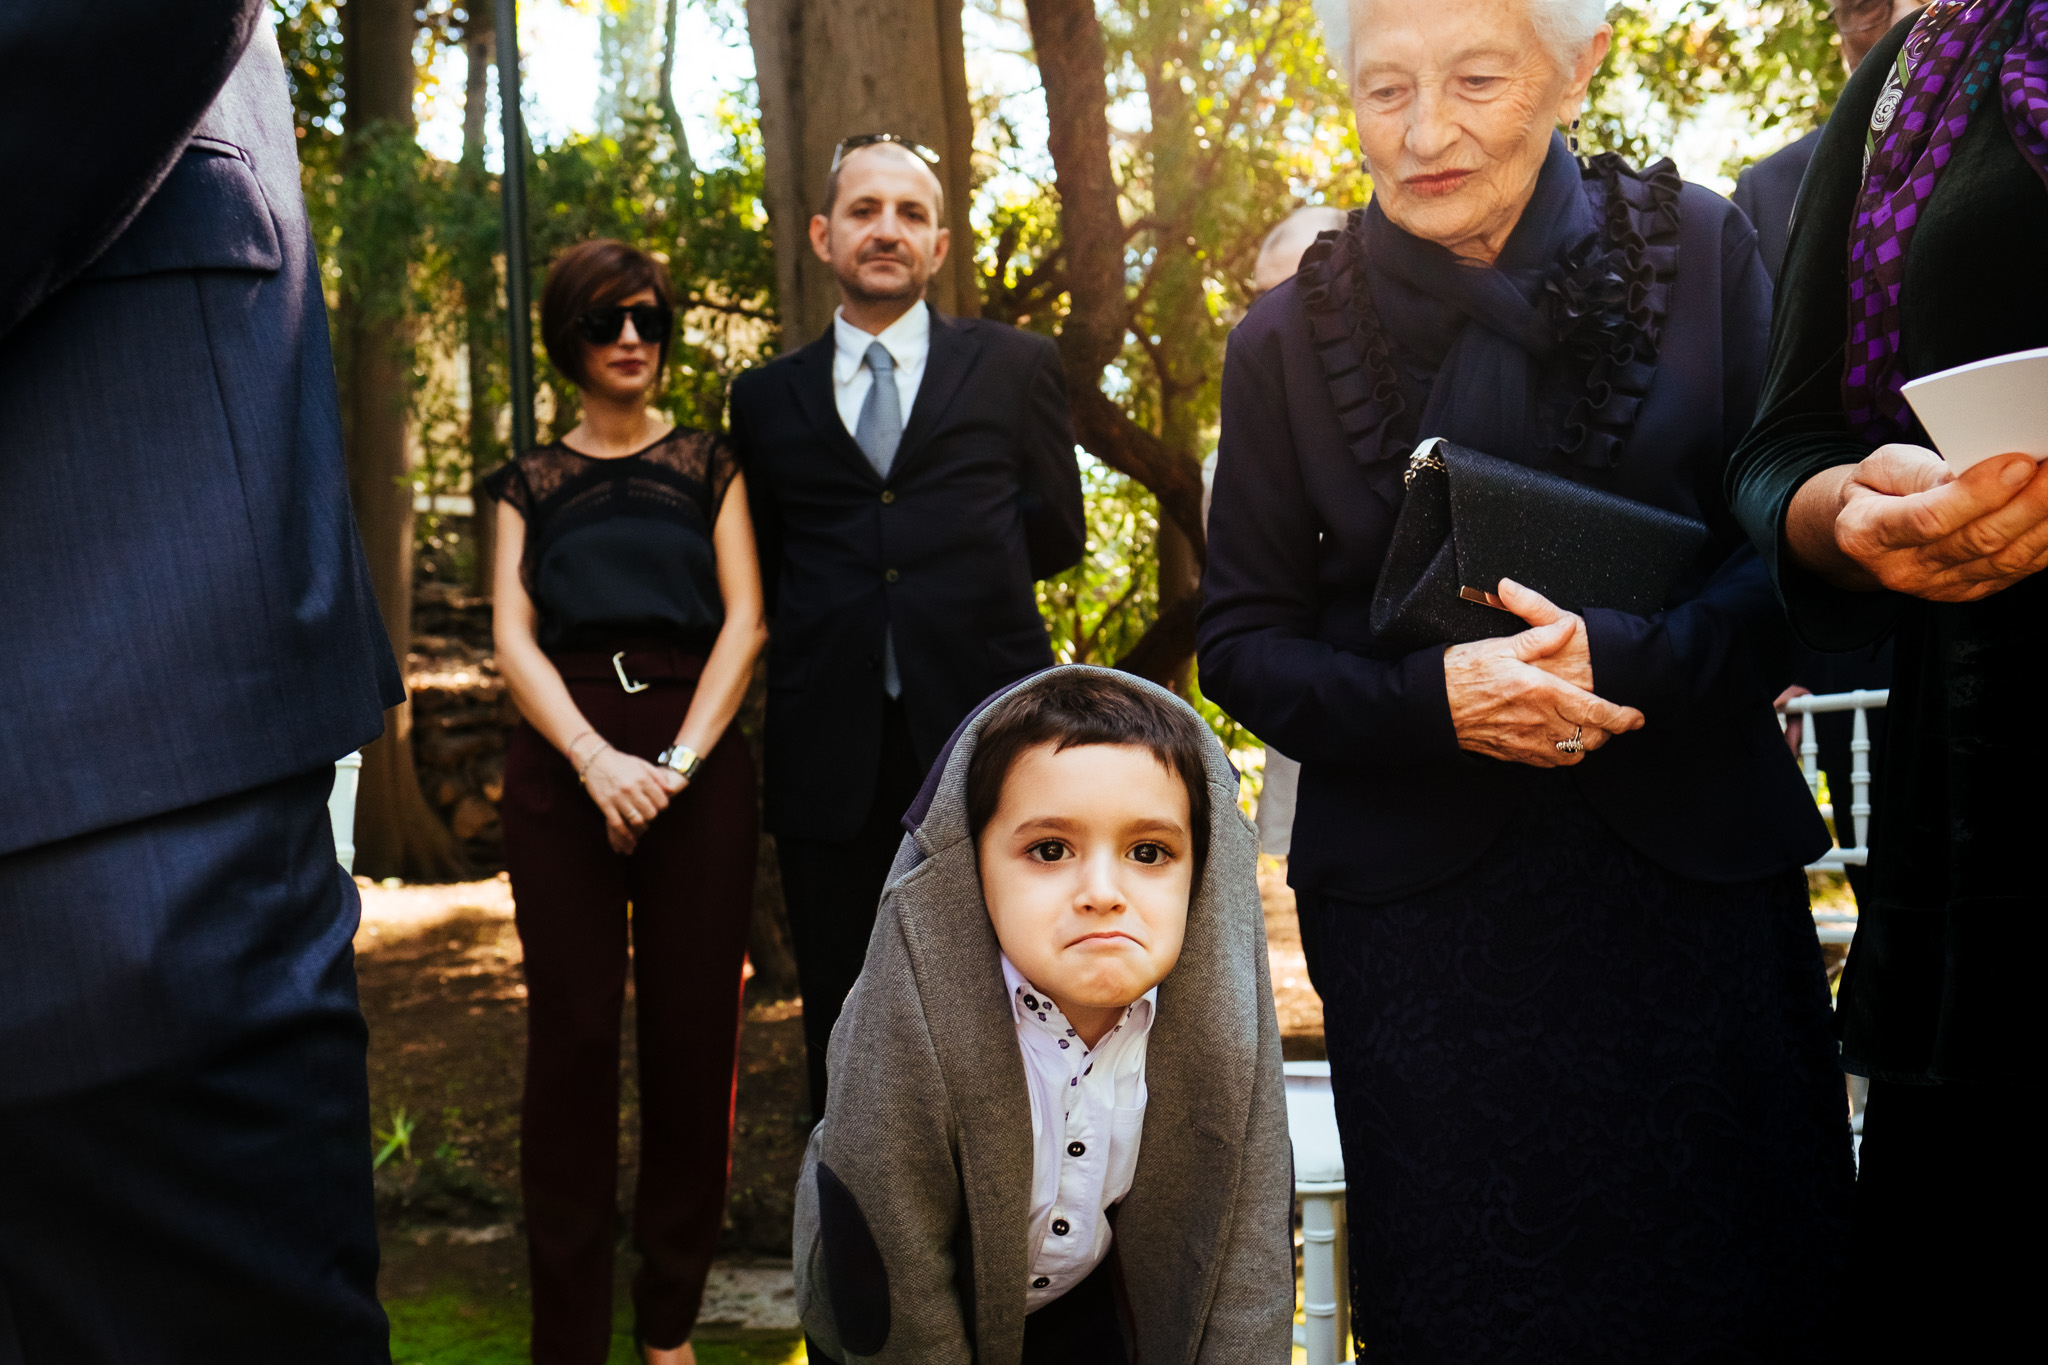 matrimonio-a-catania-29.jpg